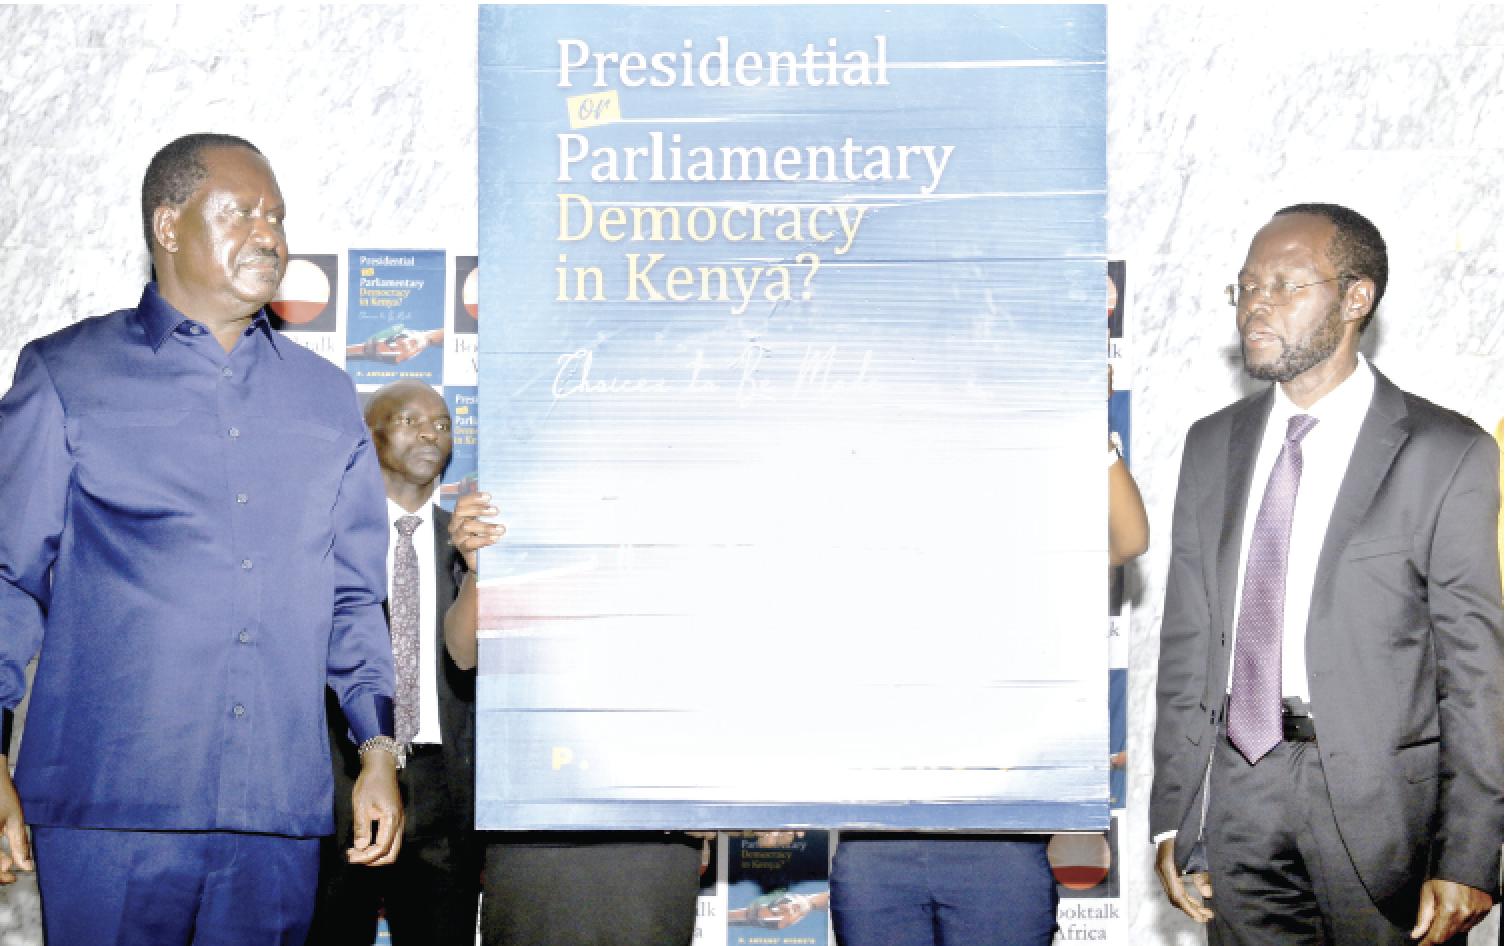 Opposition leader Raila Odinga (left) with Kisumu Governor Anyang' Nyong'o during the launch of the latter's book at the University of Nairobi on Tuesday. PD/TIMOTHY NJENGA